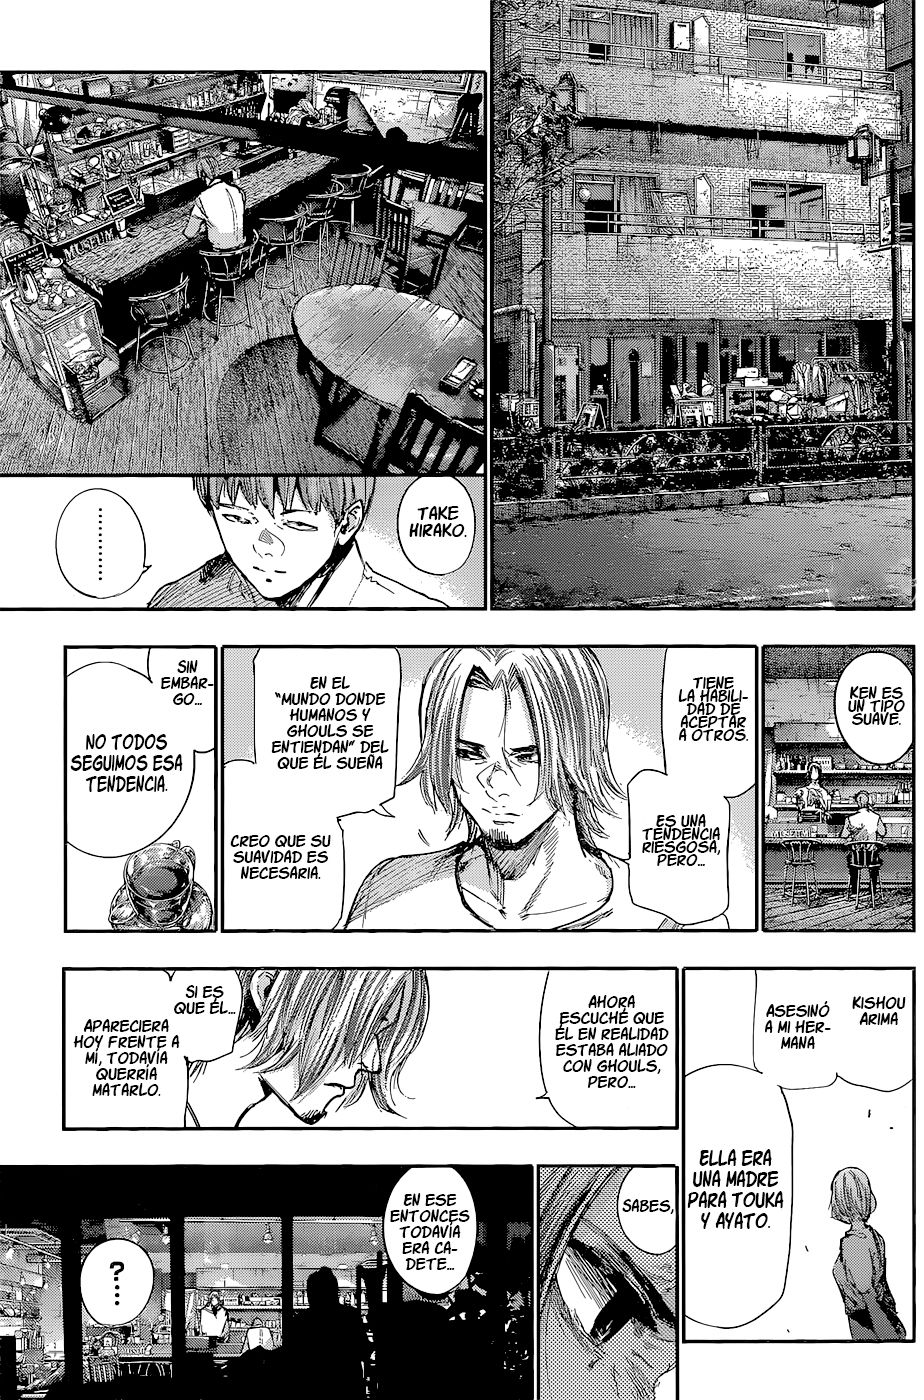 http://c5.ninemanga.com/es_manga/pic2/59/59/516653/ac9048c9655bcc74e6fae933e9ce36ec.jpg Page 9